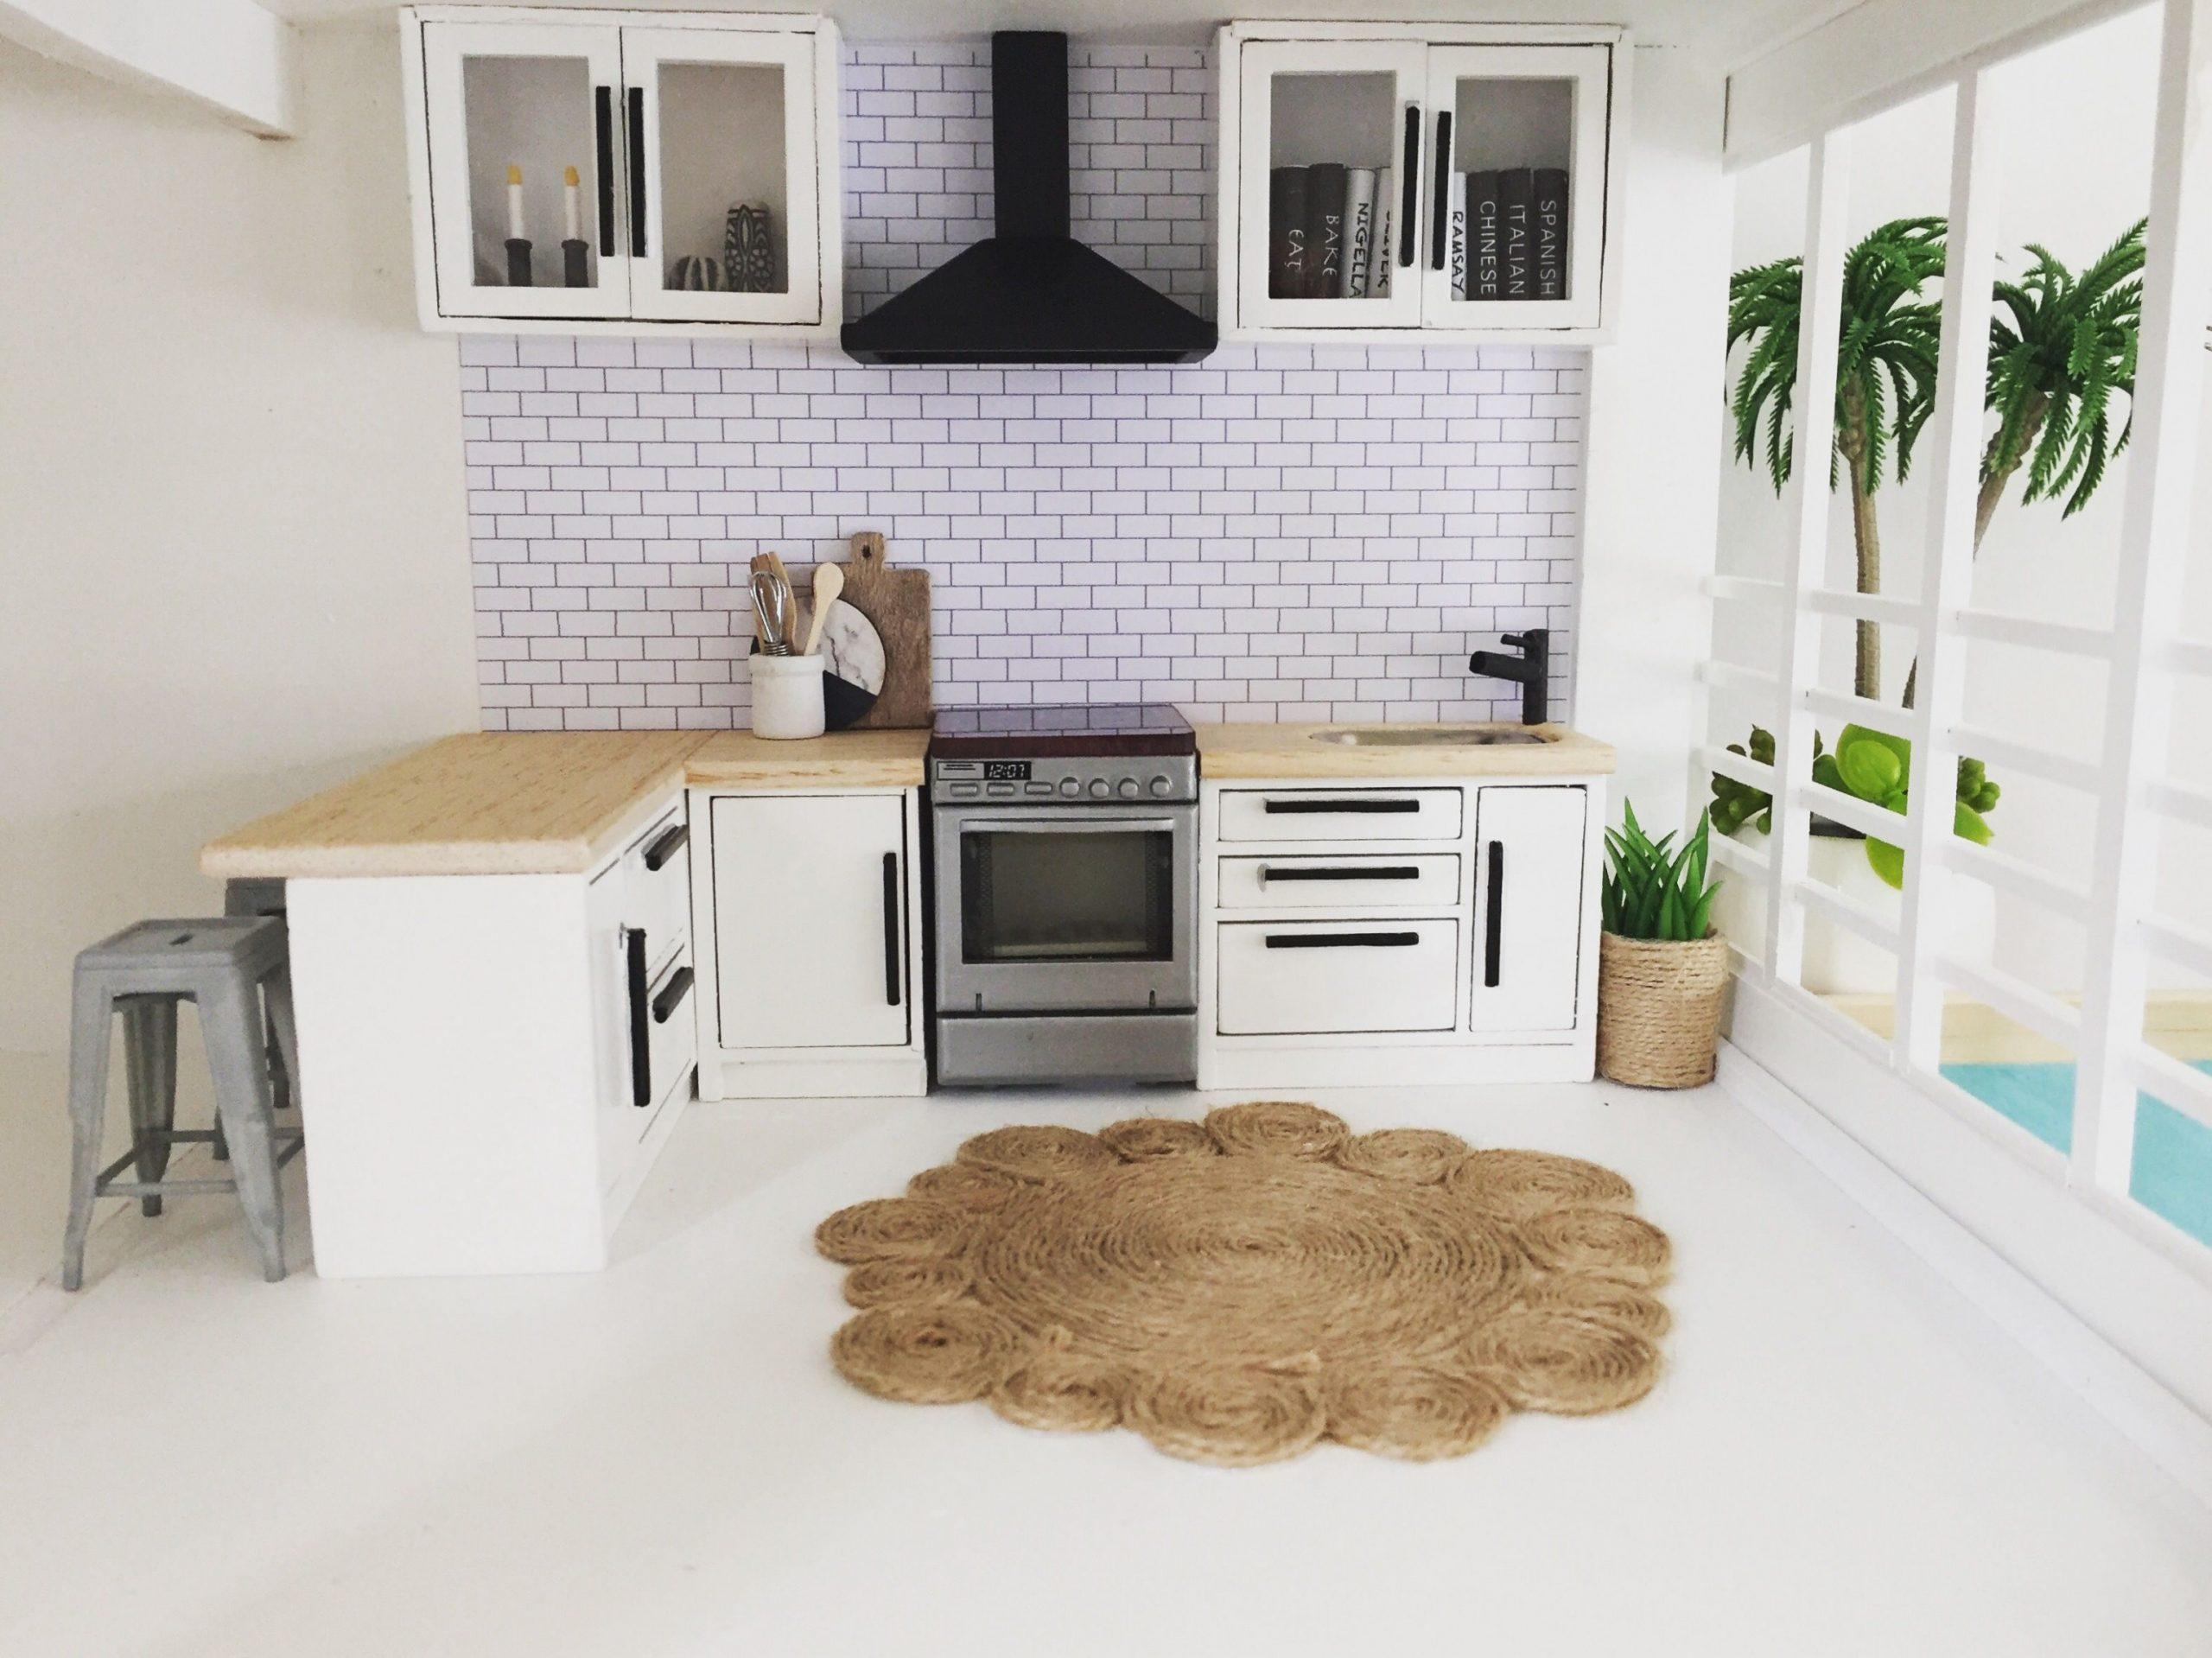 Miniature dollhouse kitchen 9:92 scale, modern dollhouse ideas  - Dollhouse Kitchen Cabinet Kit